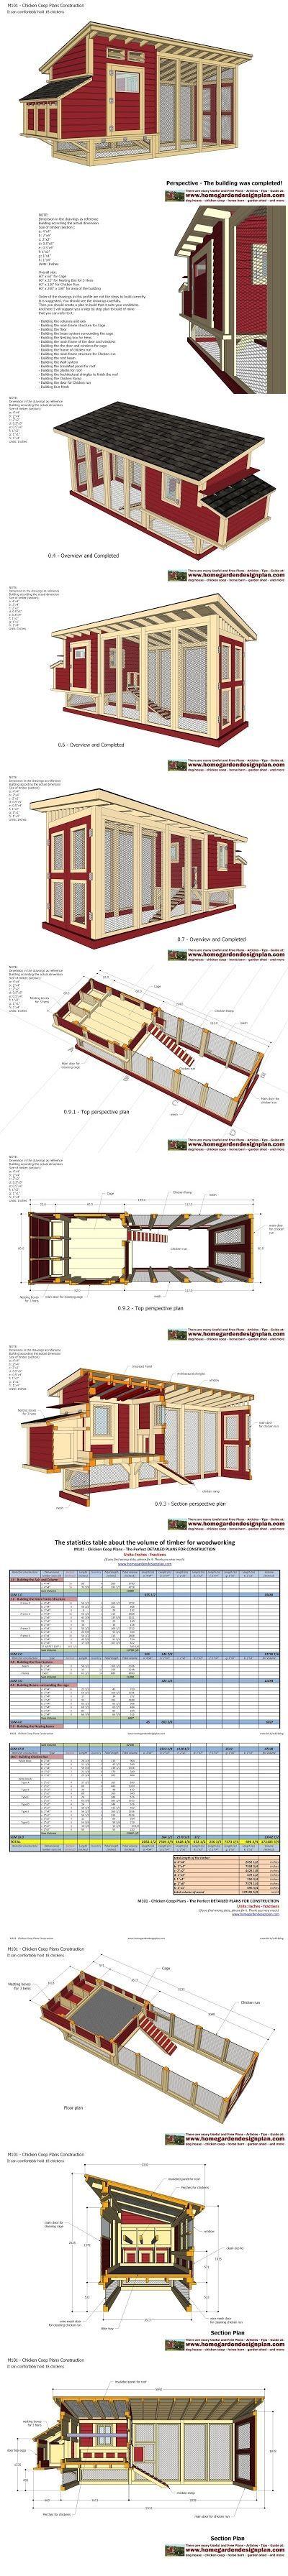 M101 Chicken Coop Plans Construction Chicken Coop Design How To Build A Chicken Coop